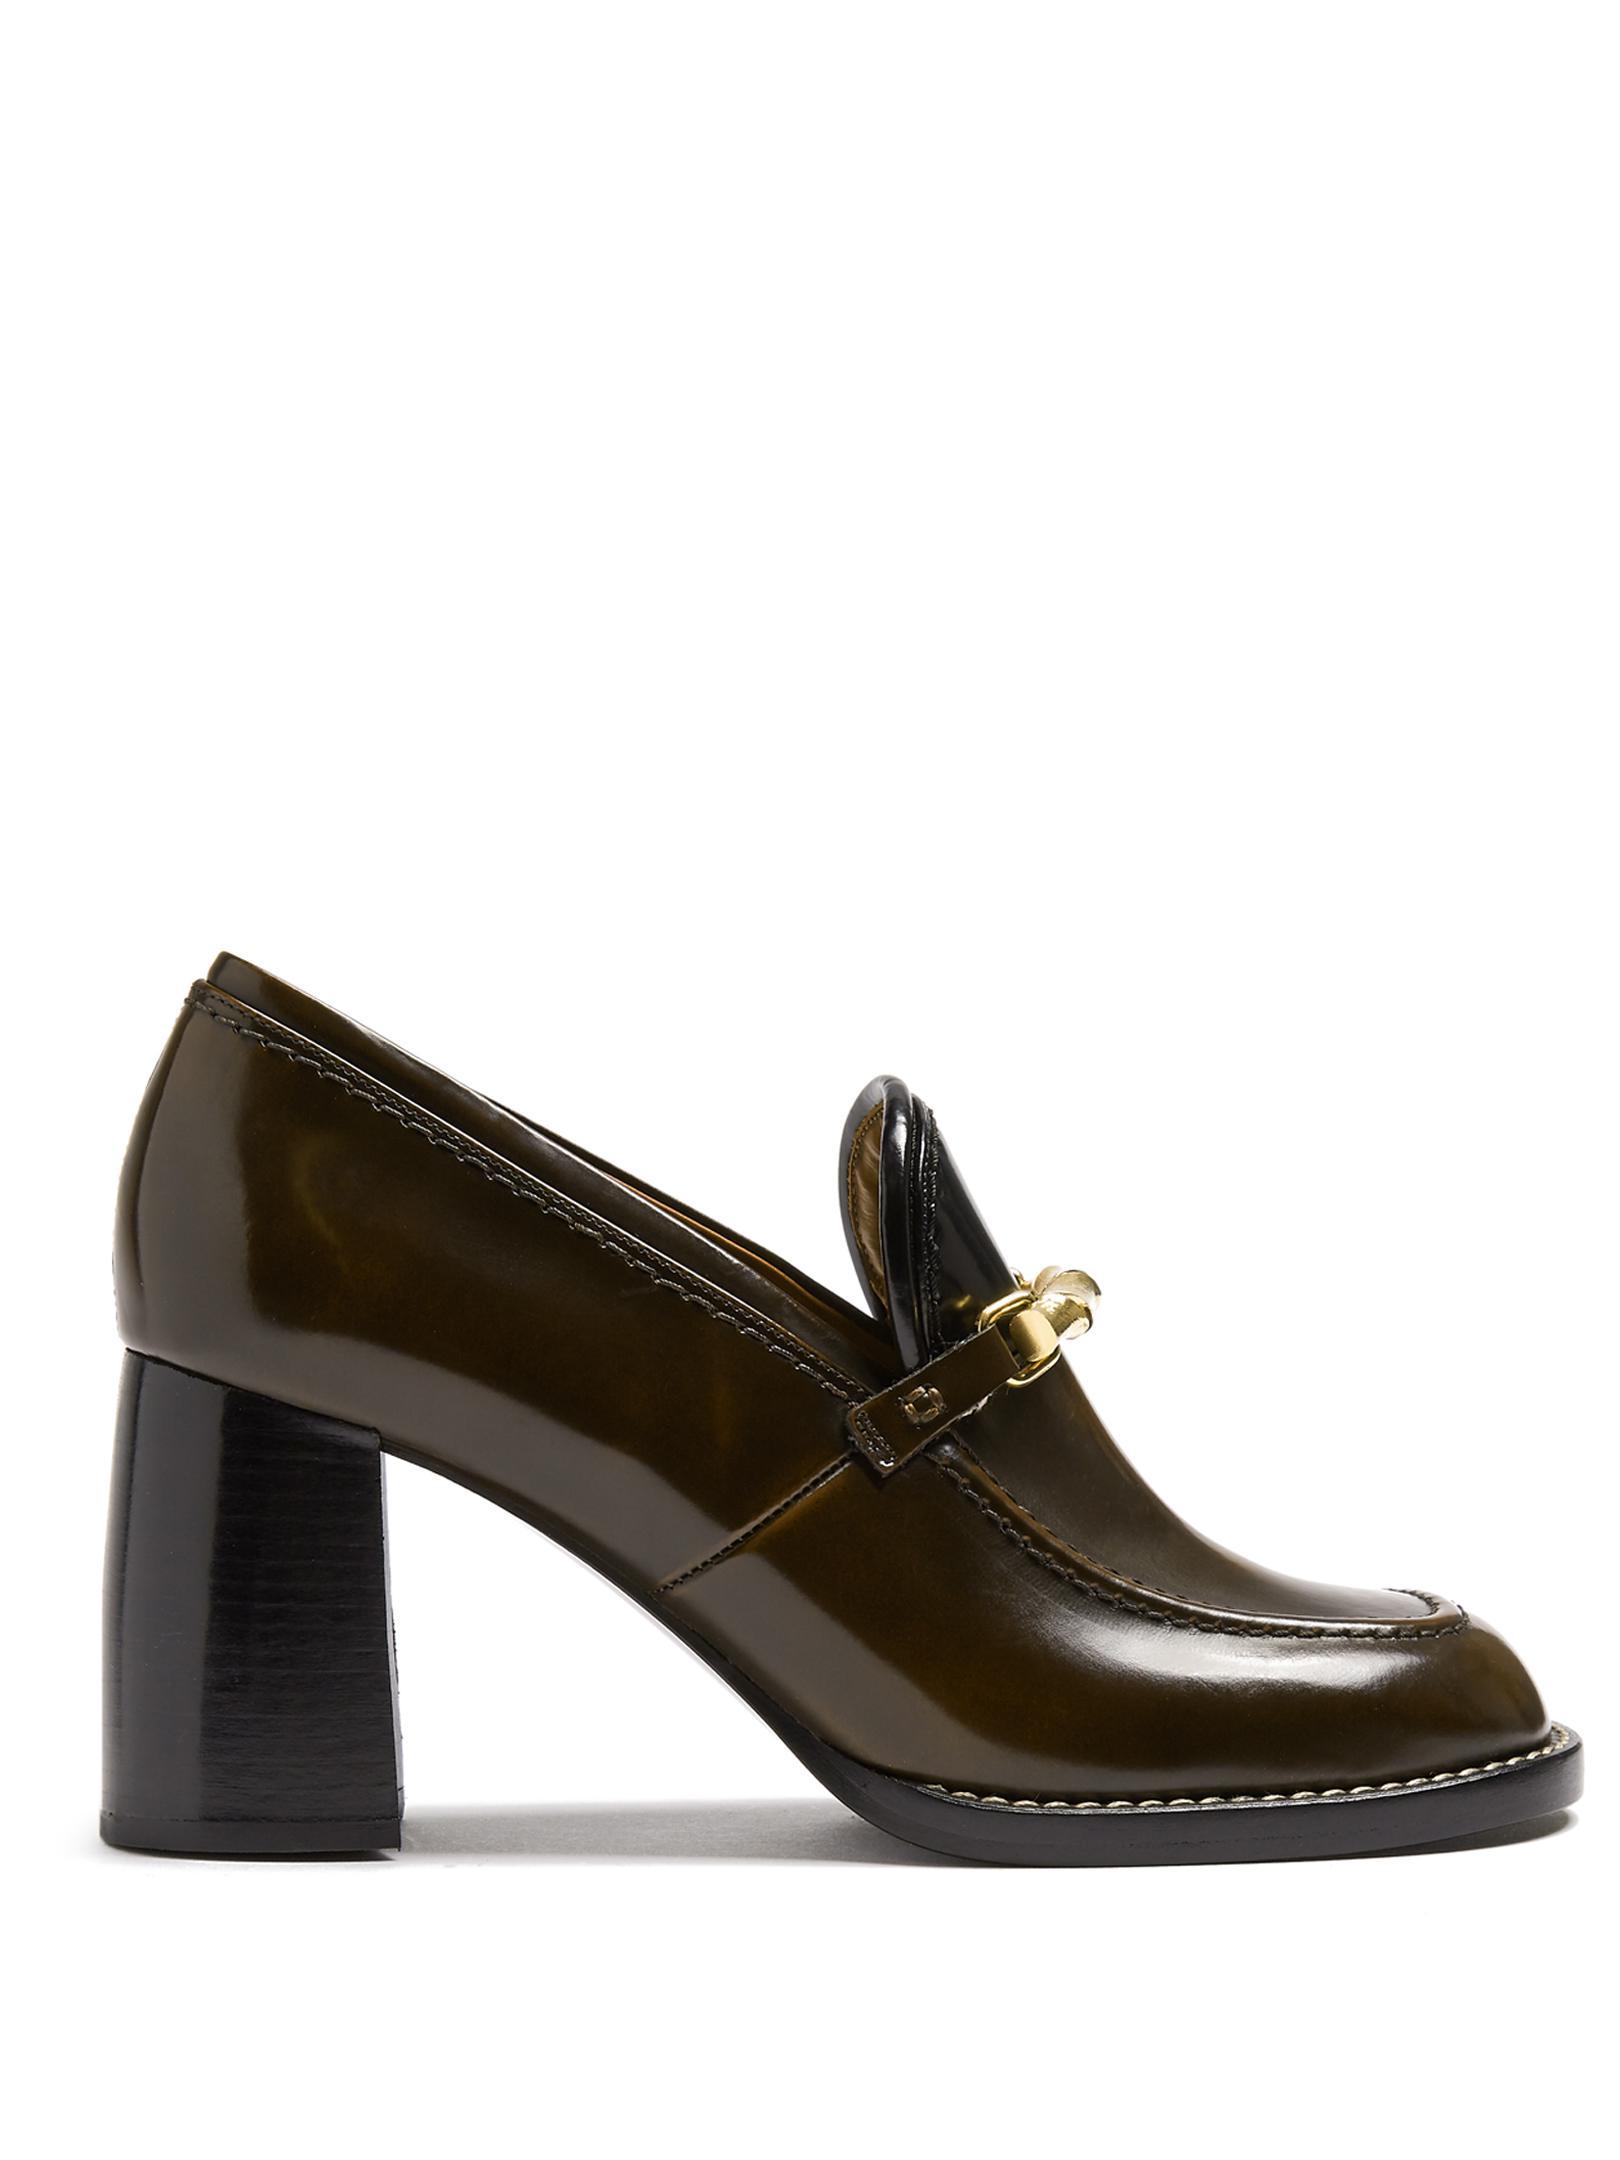 Shoes Stores In Saint Joseph